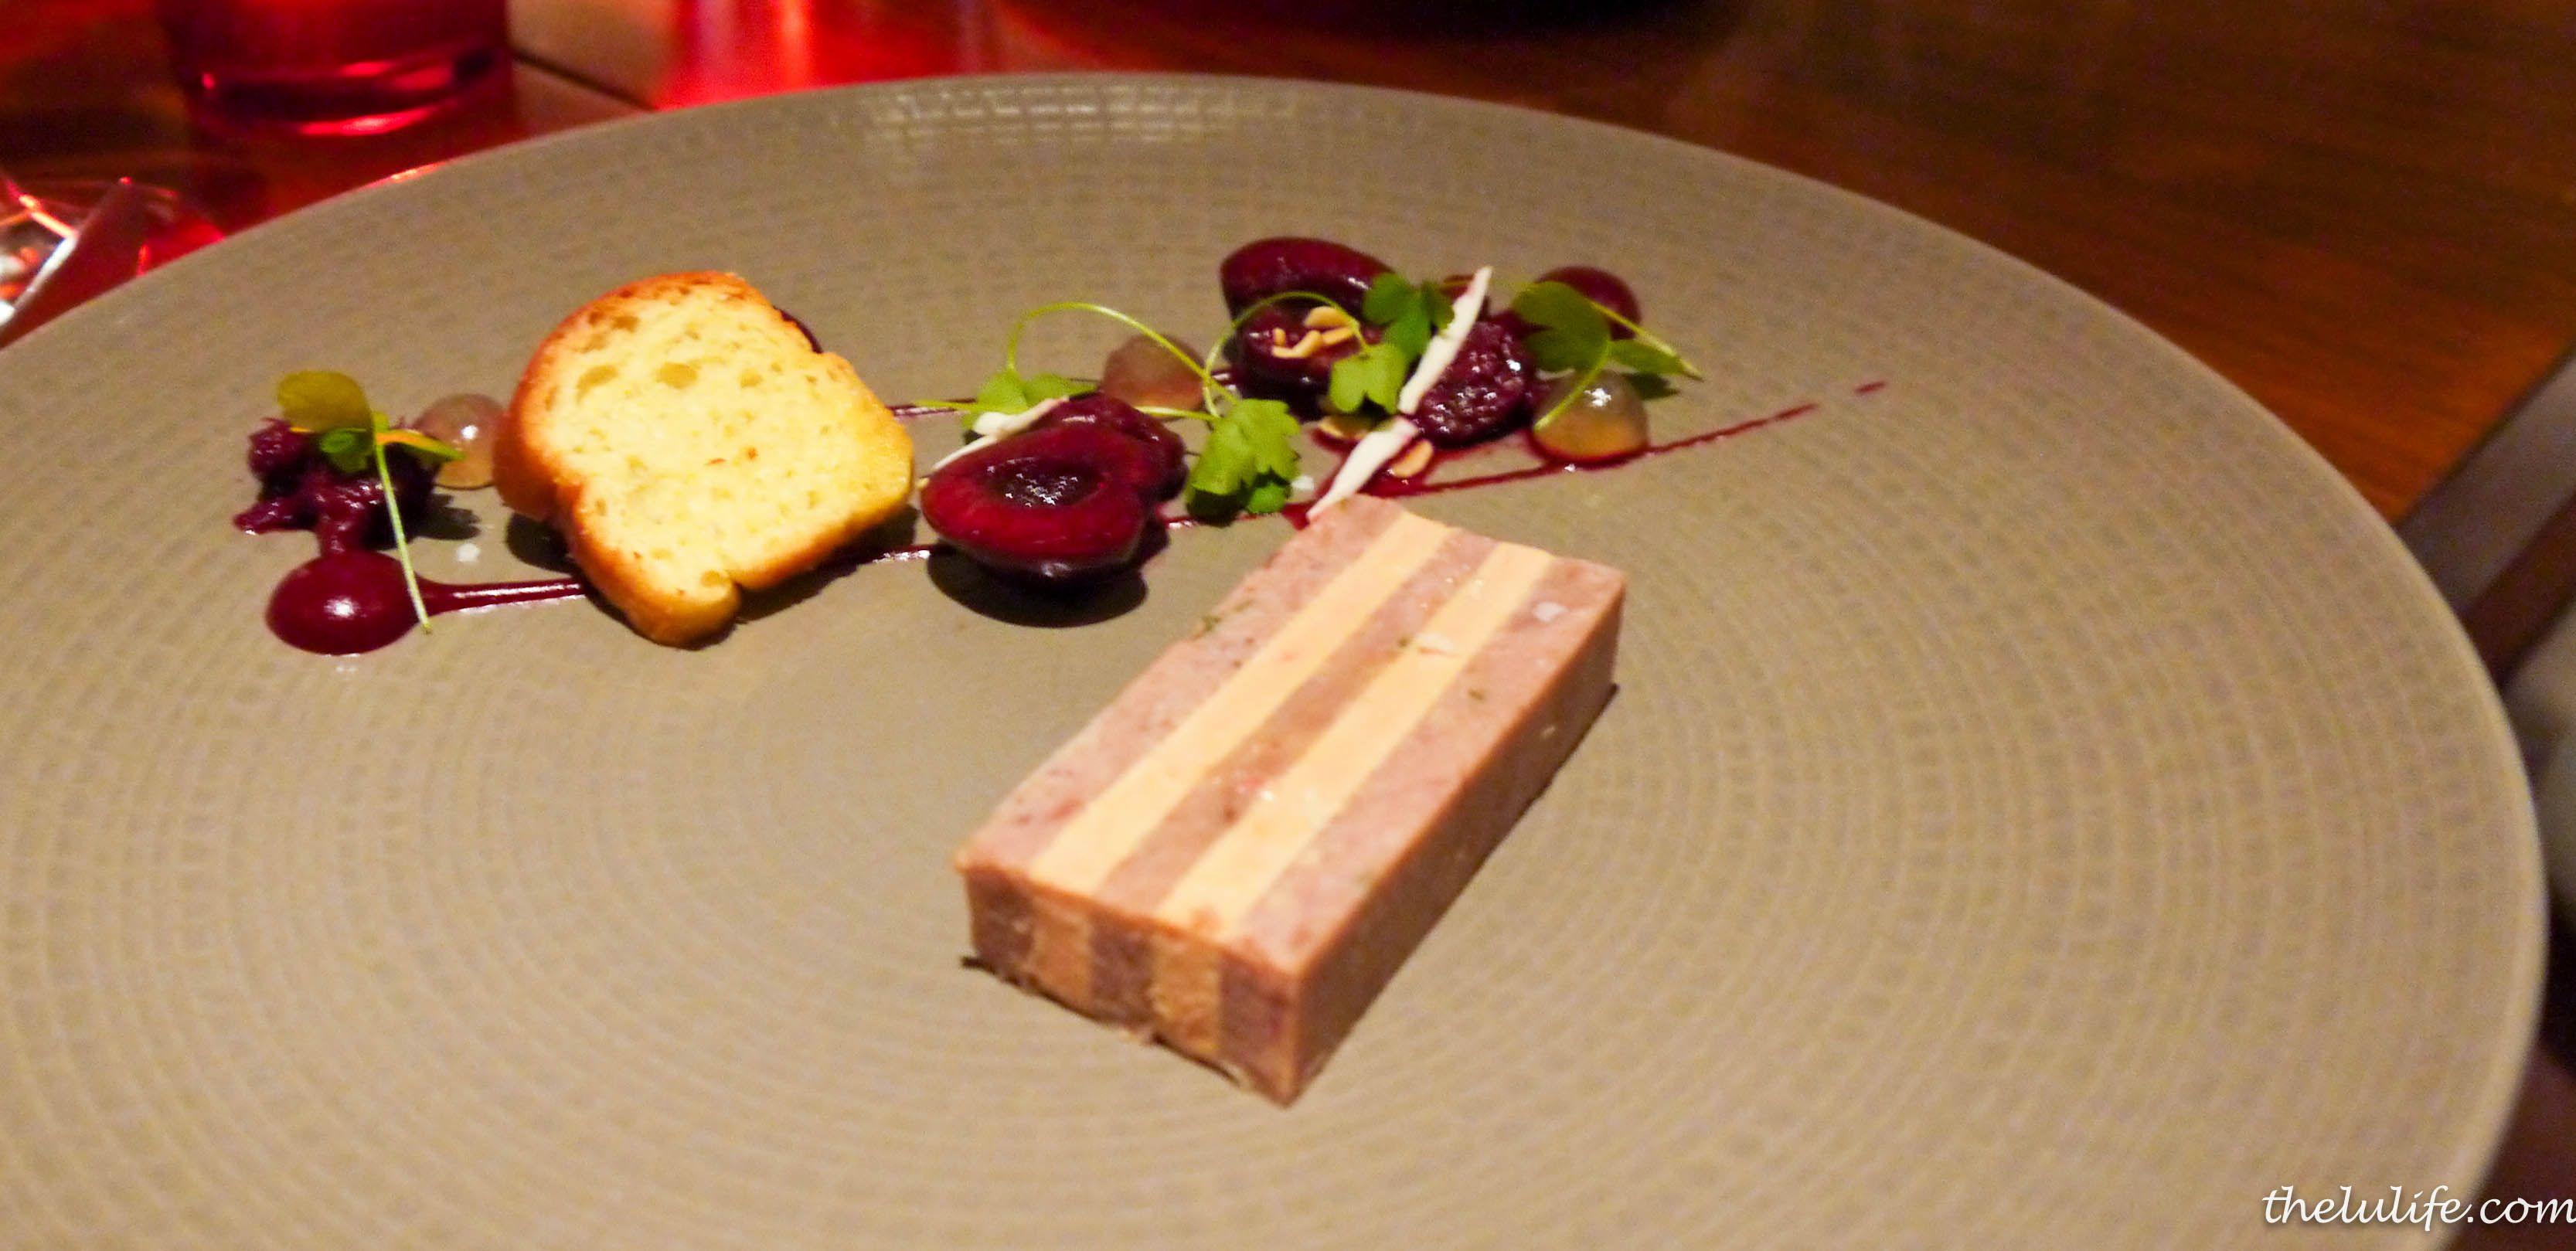 p1070256 duck and foie gras terrine cherries wet almonds. Black Bedroom Furniture Sets. Home Design Ideas